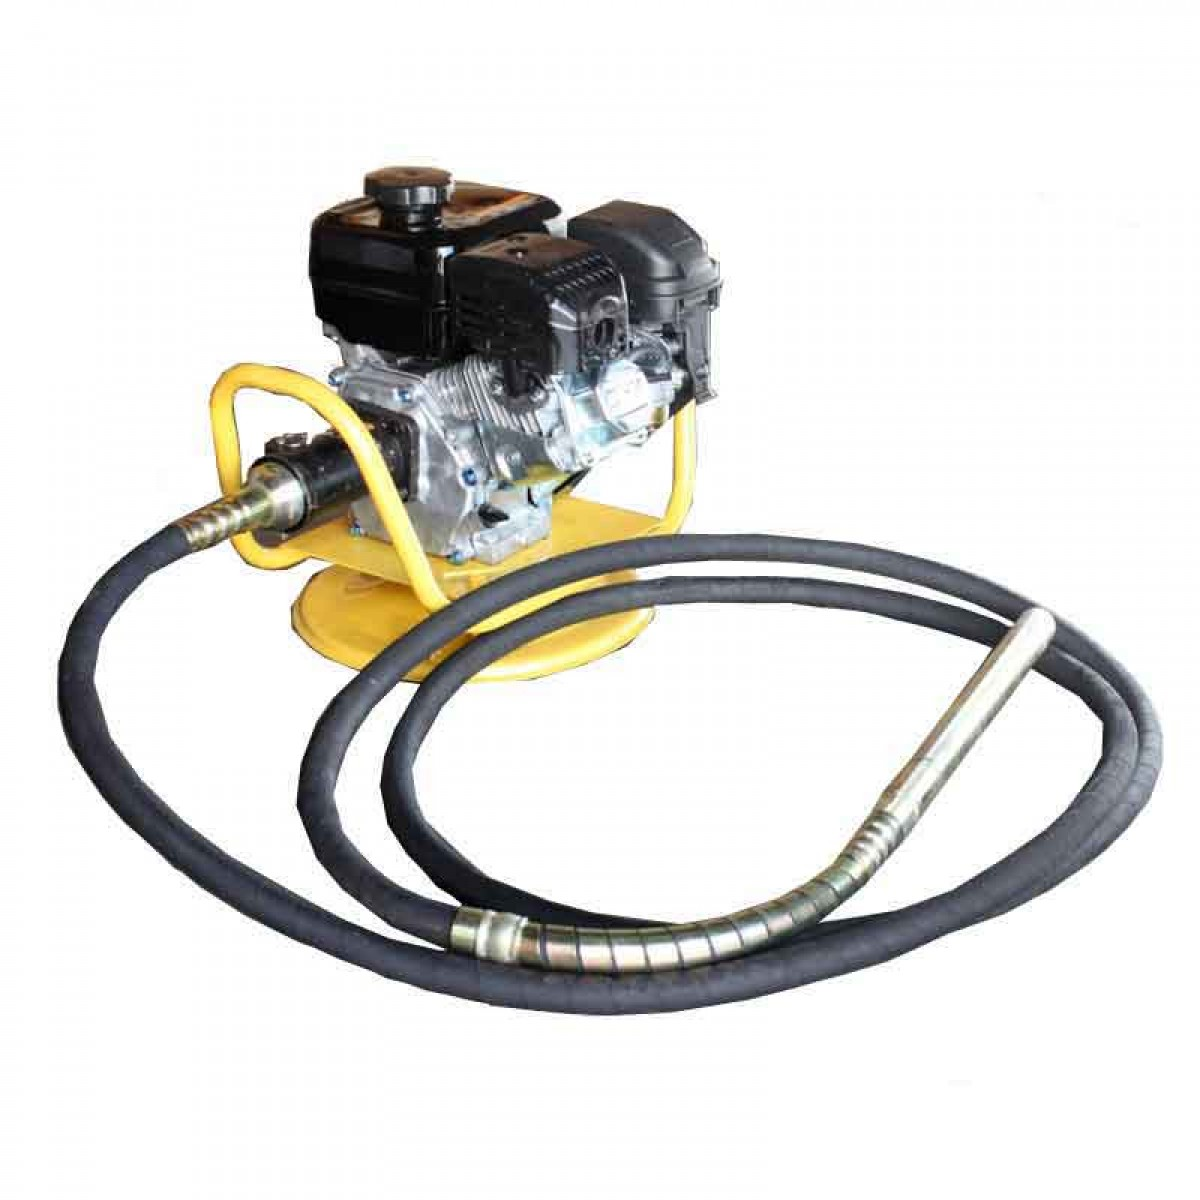 hose vibrator Concrete